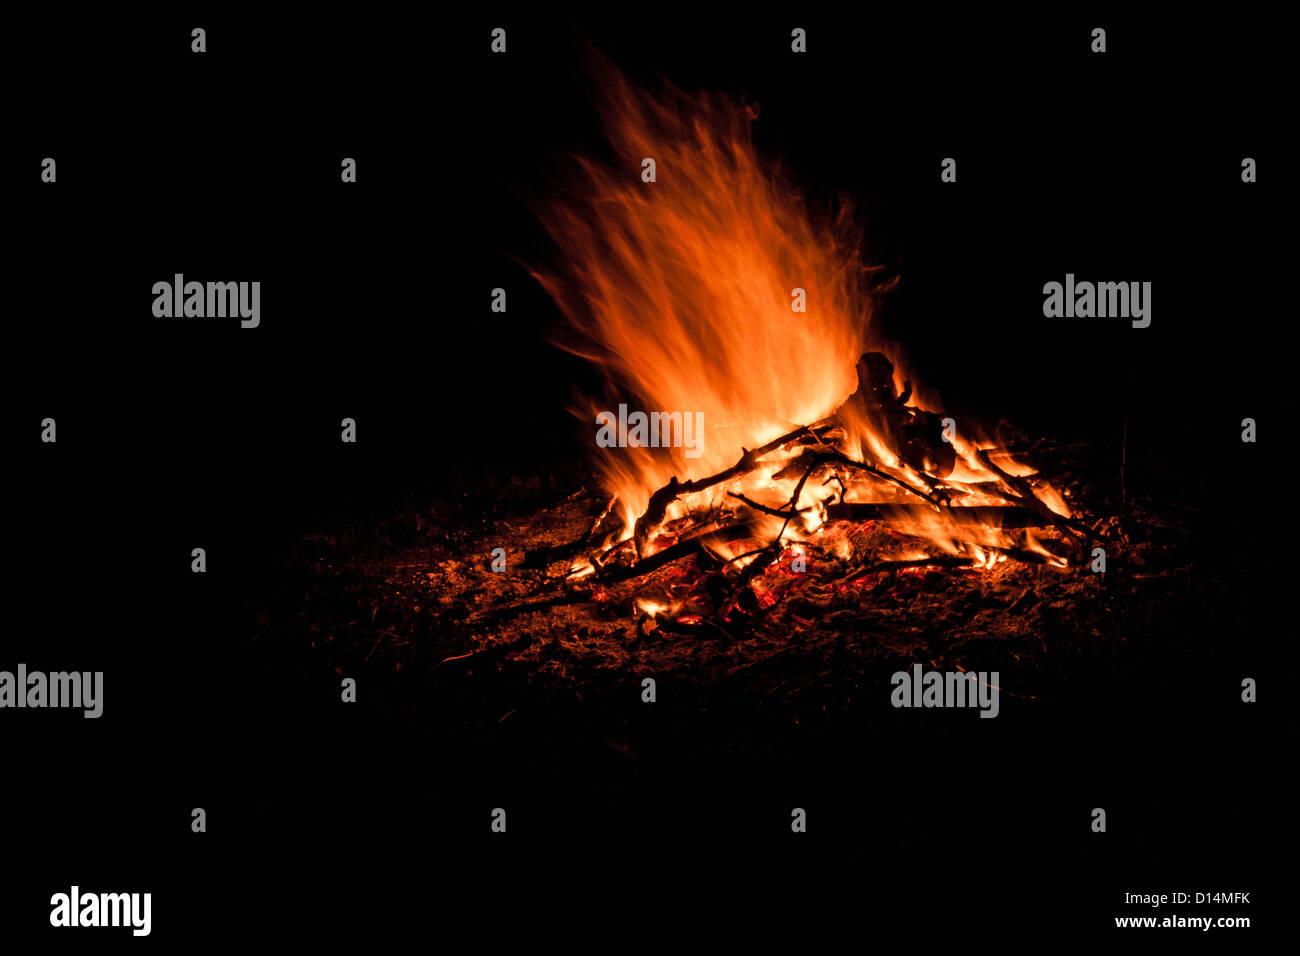 blaze stockfotos blaze bilder alamy. Black Bedroom Furniture Sets. Home Design Ideas